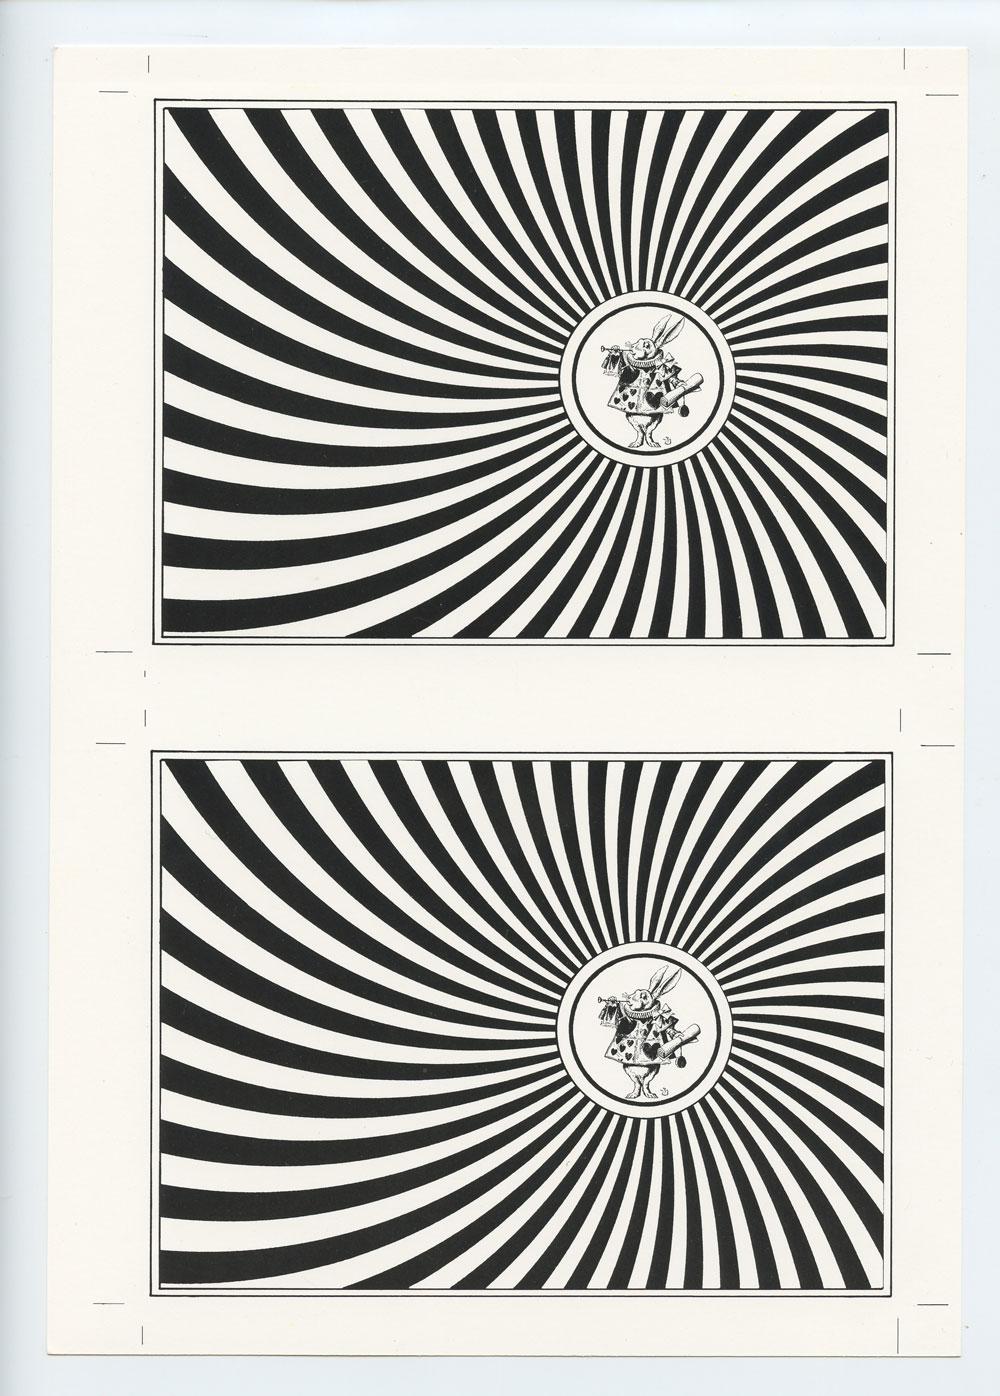 Blotter Acid Art Exhibit Reception Postcard Uncut Through The Looking Glass 1992 ARTROCK